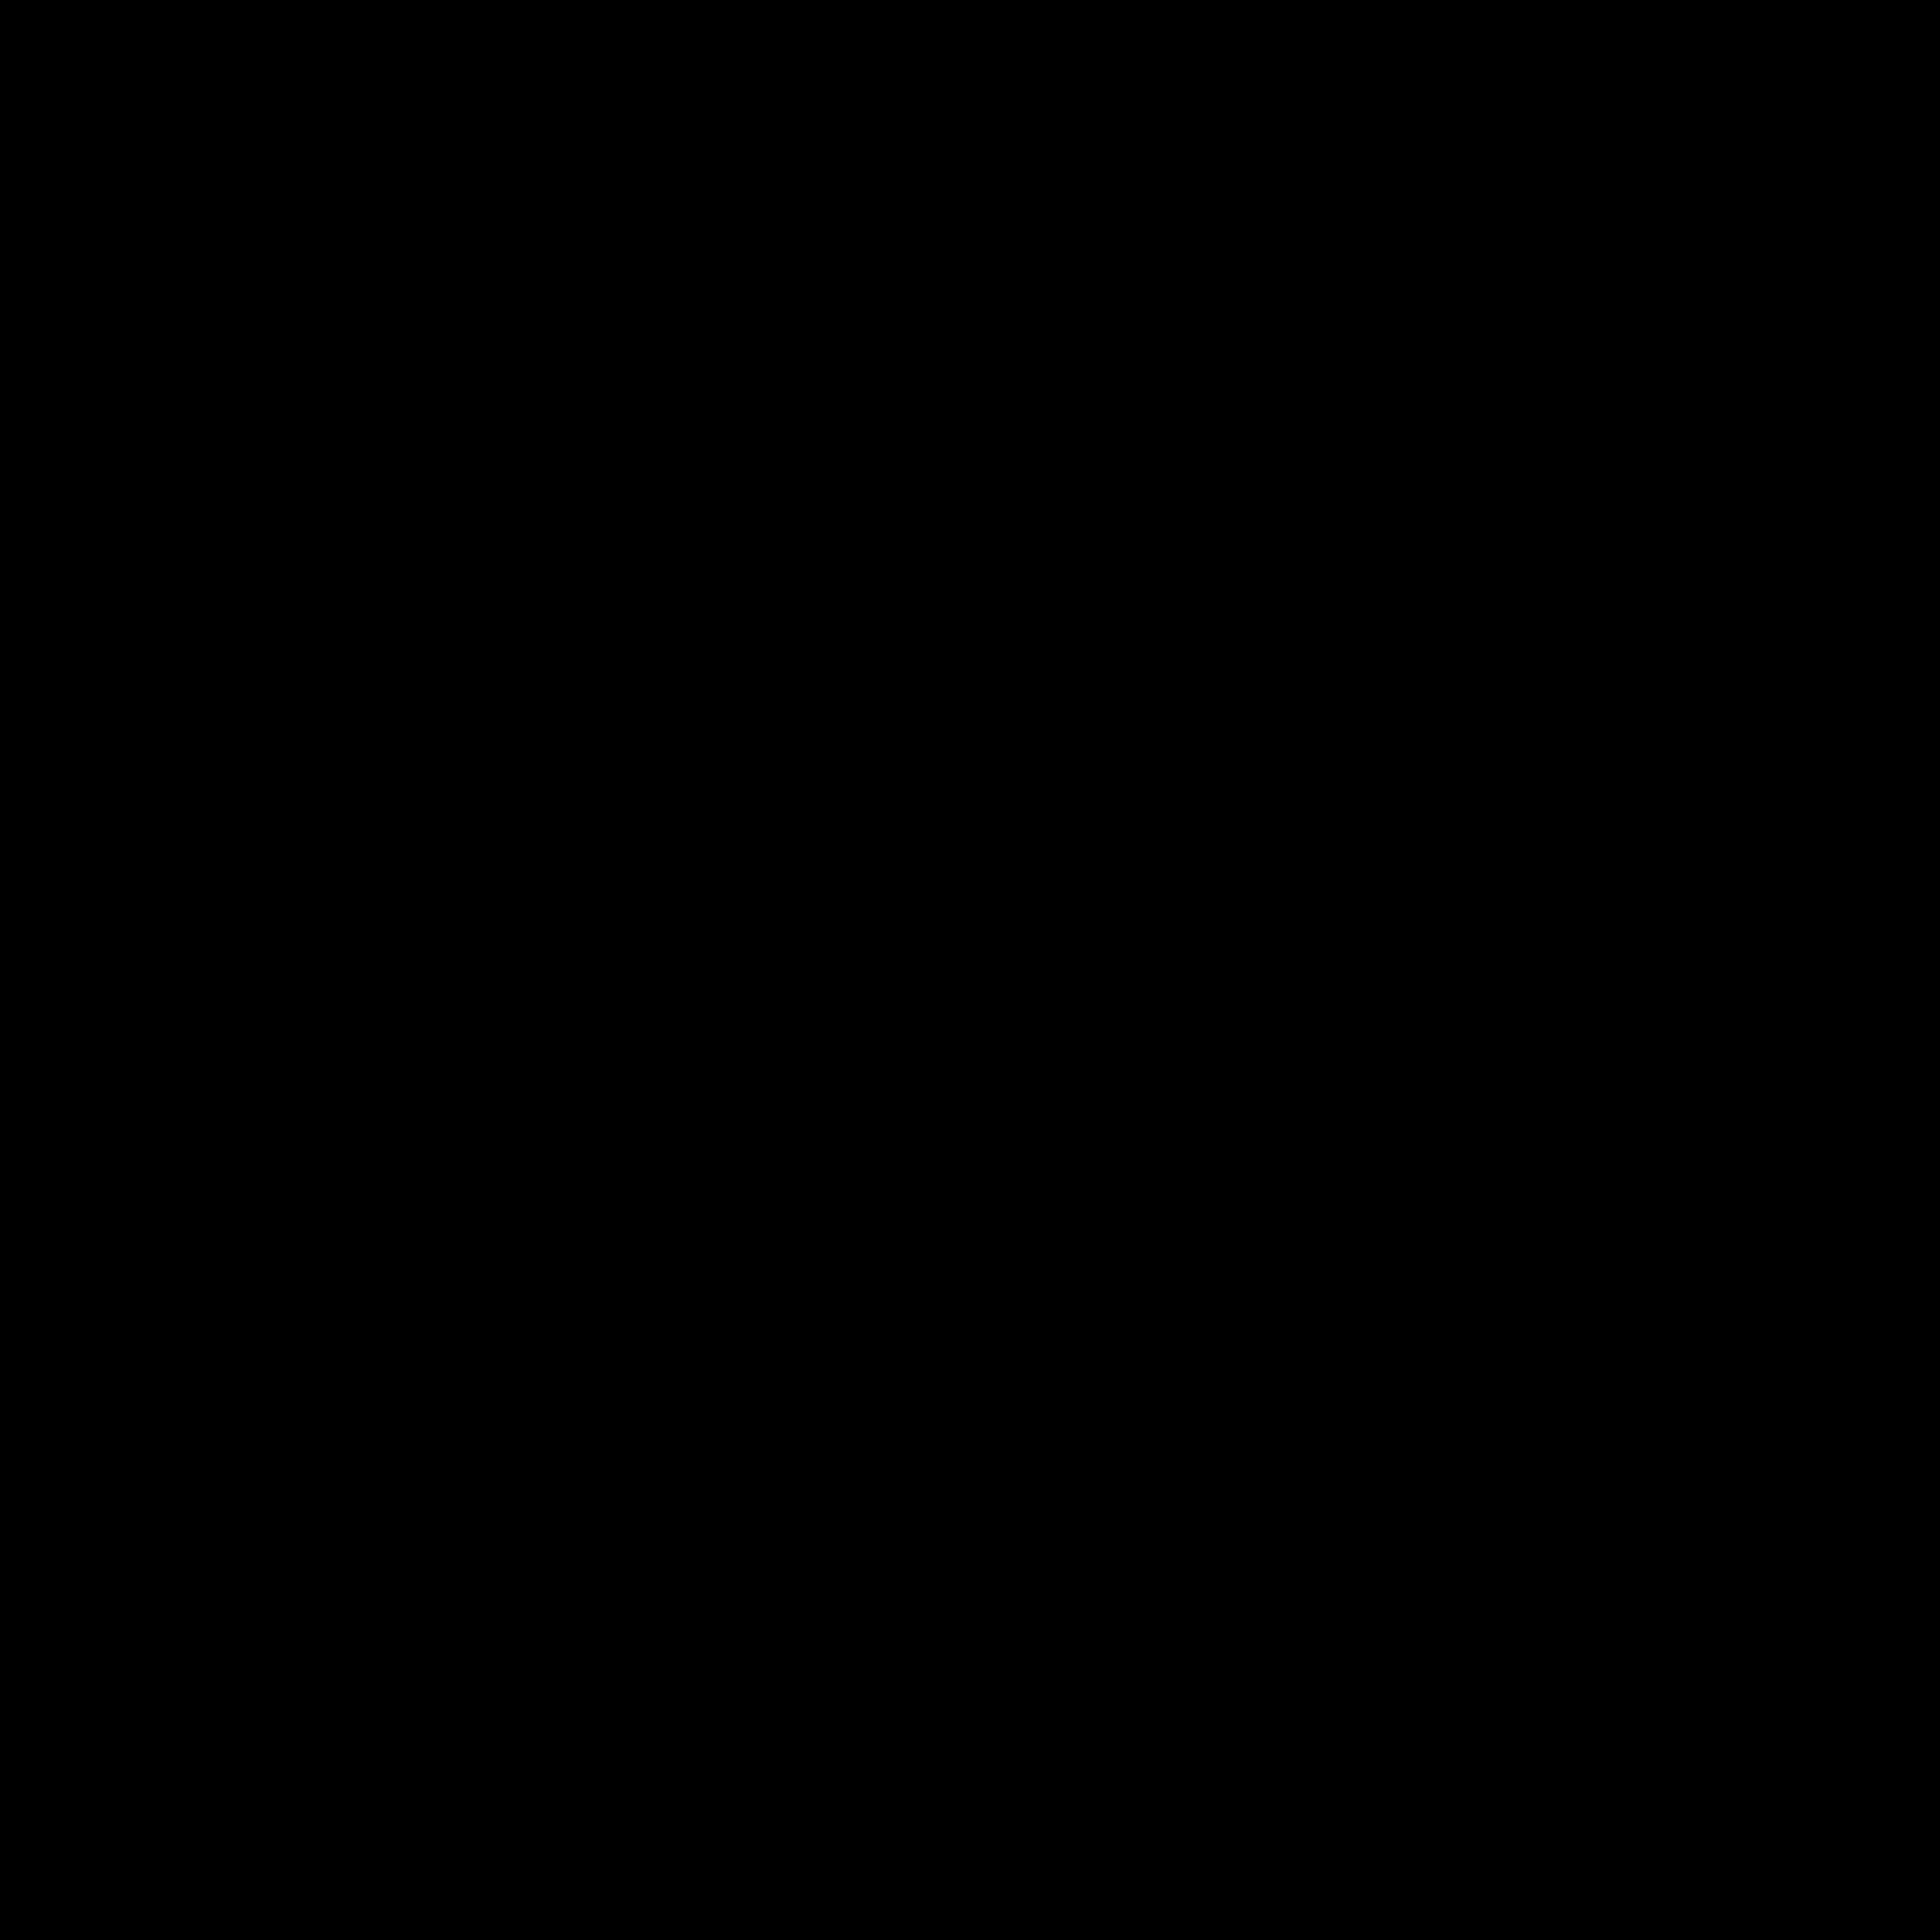 forbes logo 0 - Forbes Logo